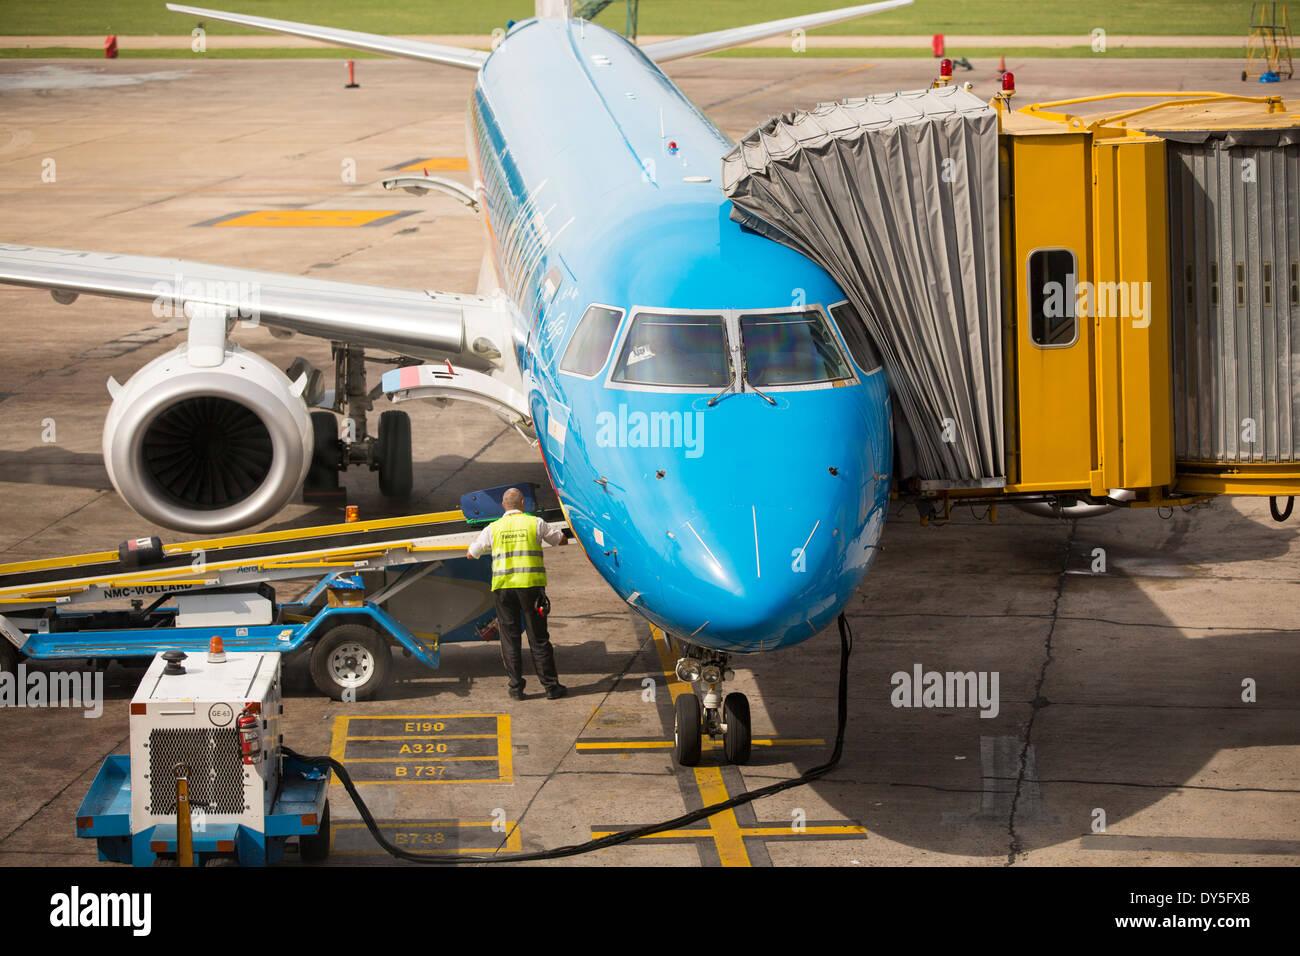 Ministro Pistarini International Airport, also known as Ezeiza, the international airport in Buenos Aires, Argentina. - Stock Image